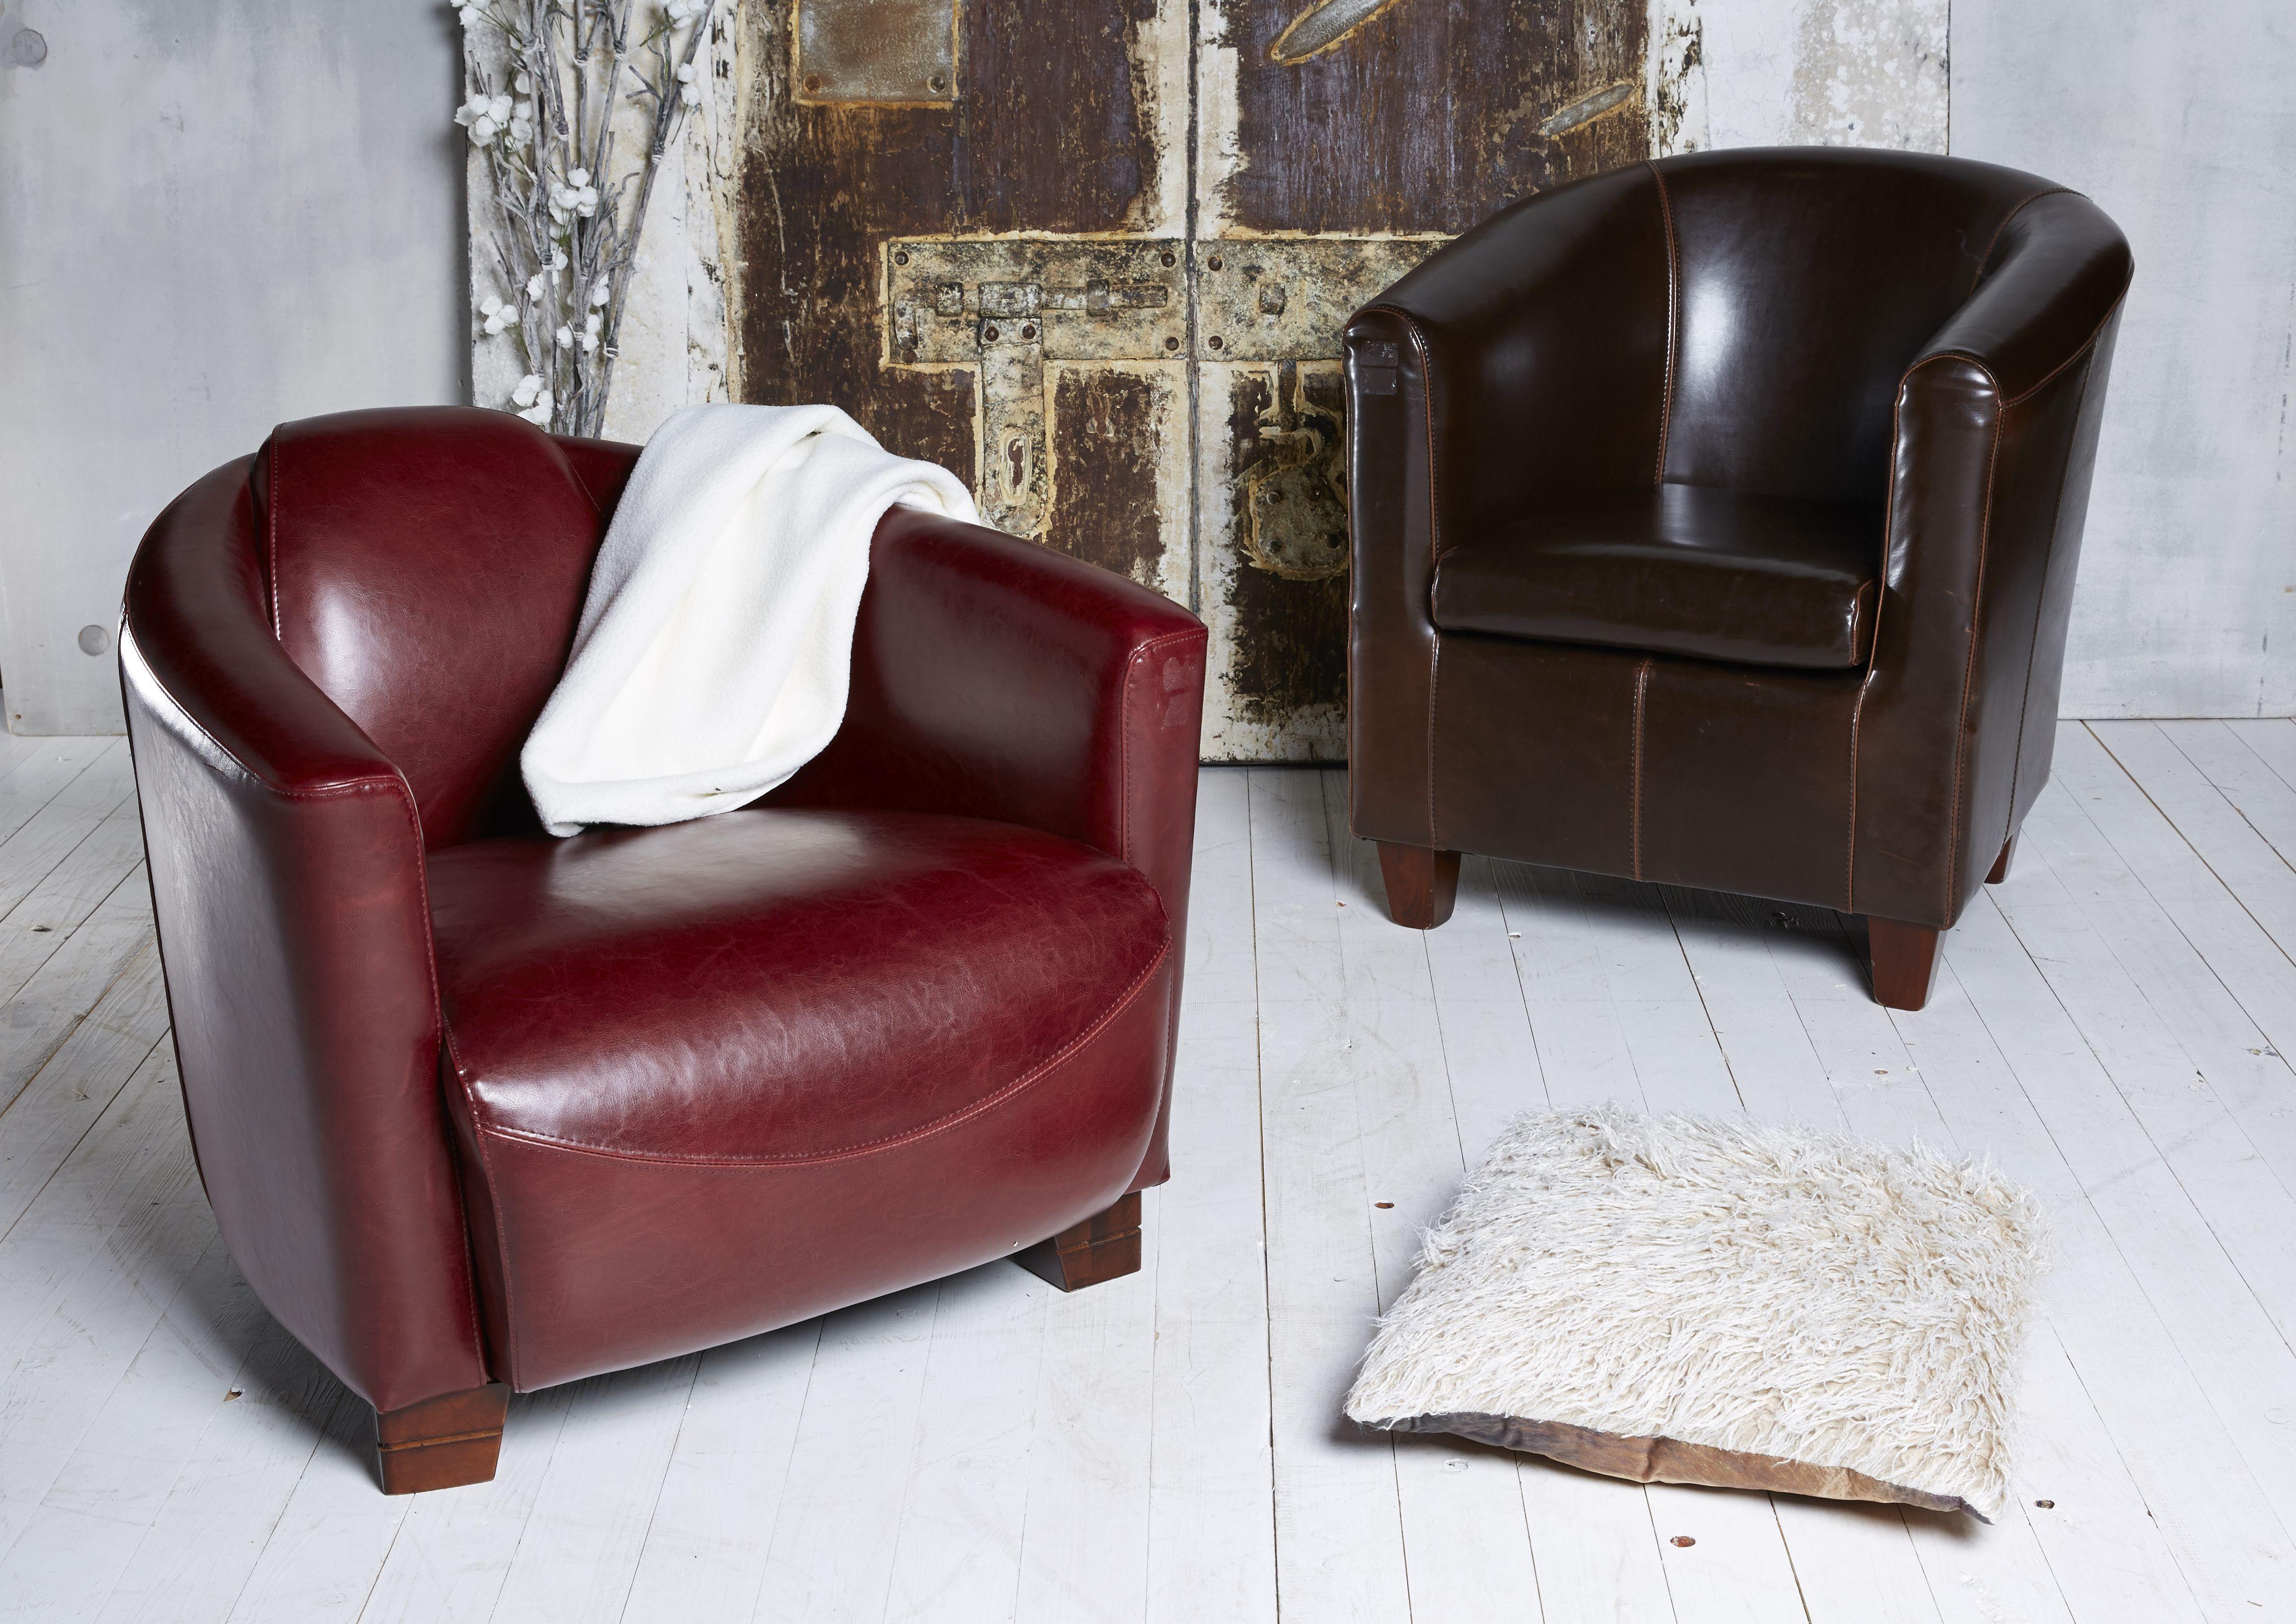 Club Feeling Im Wohnzimmer Lounge Sessel Aus Echtleder Im Antik Look Lounge Sessel Sessel Burosessel